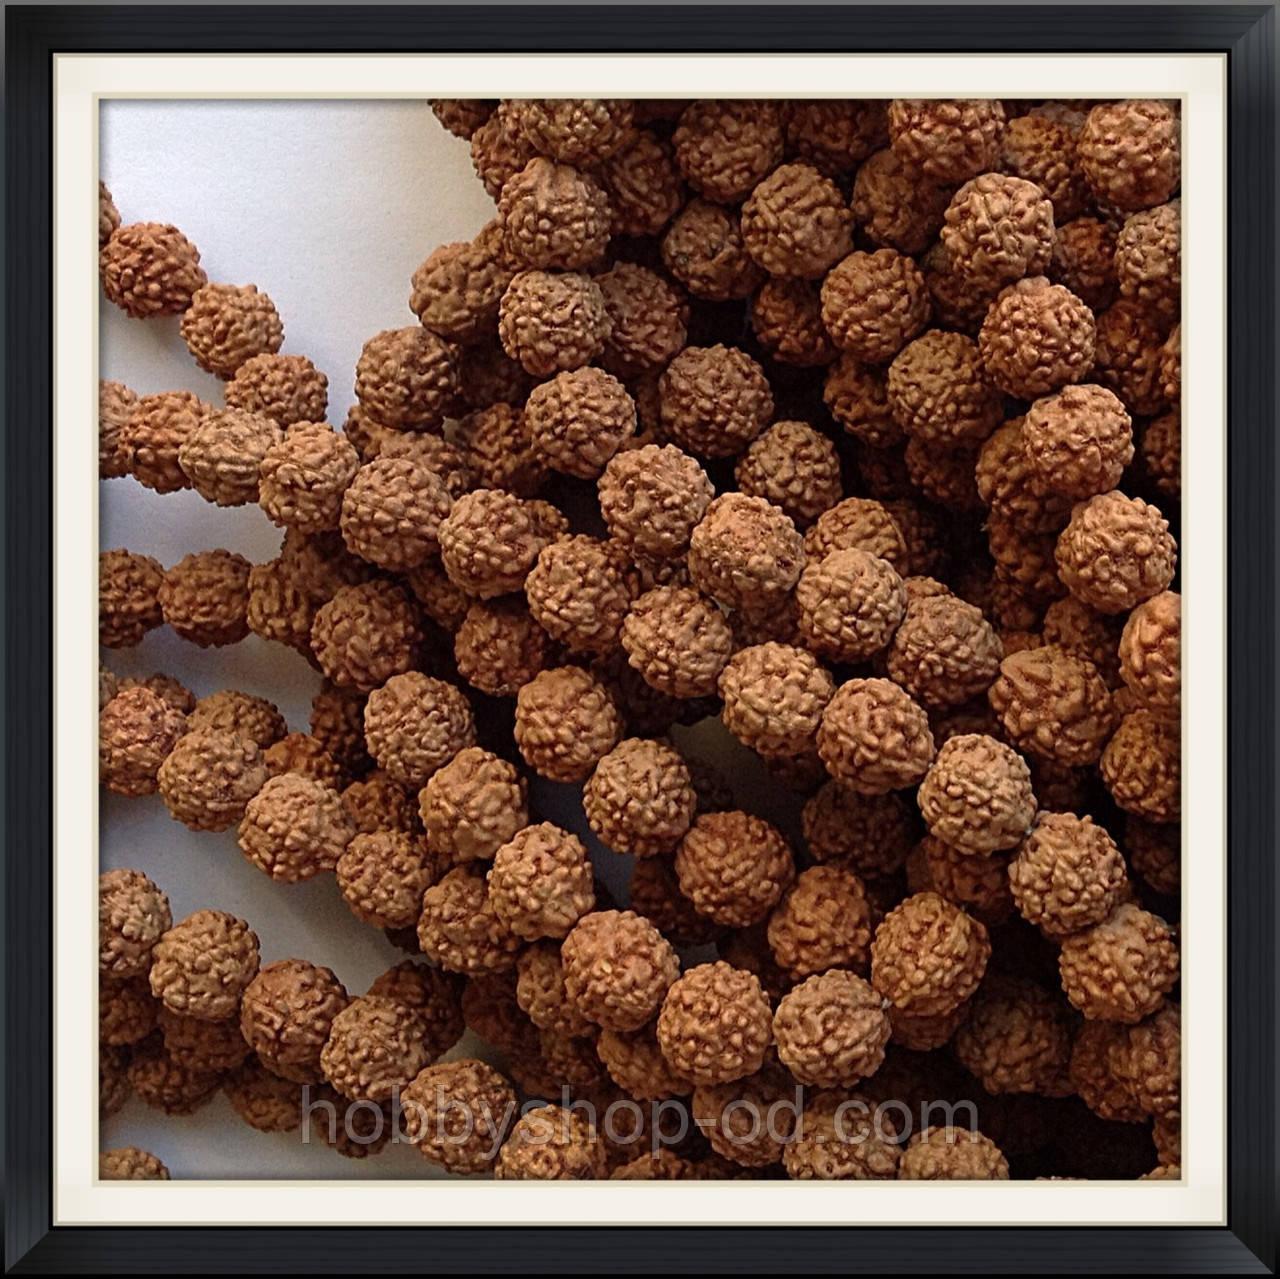 Намистини-горіхи Рудракша 1 см (108 шт)